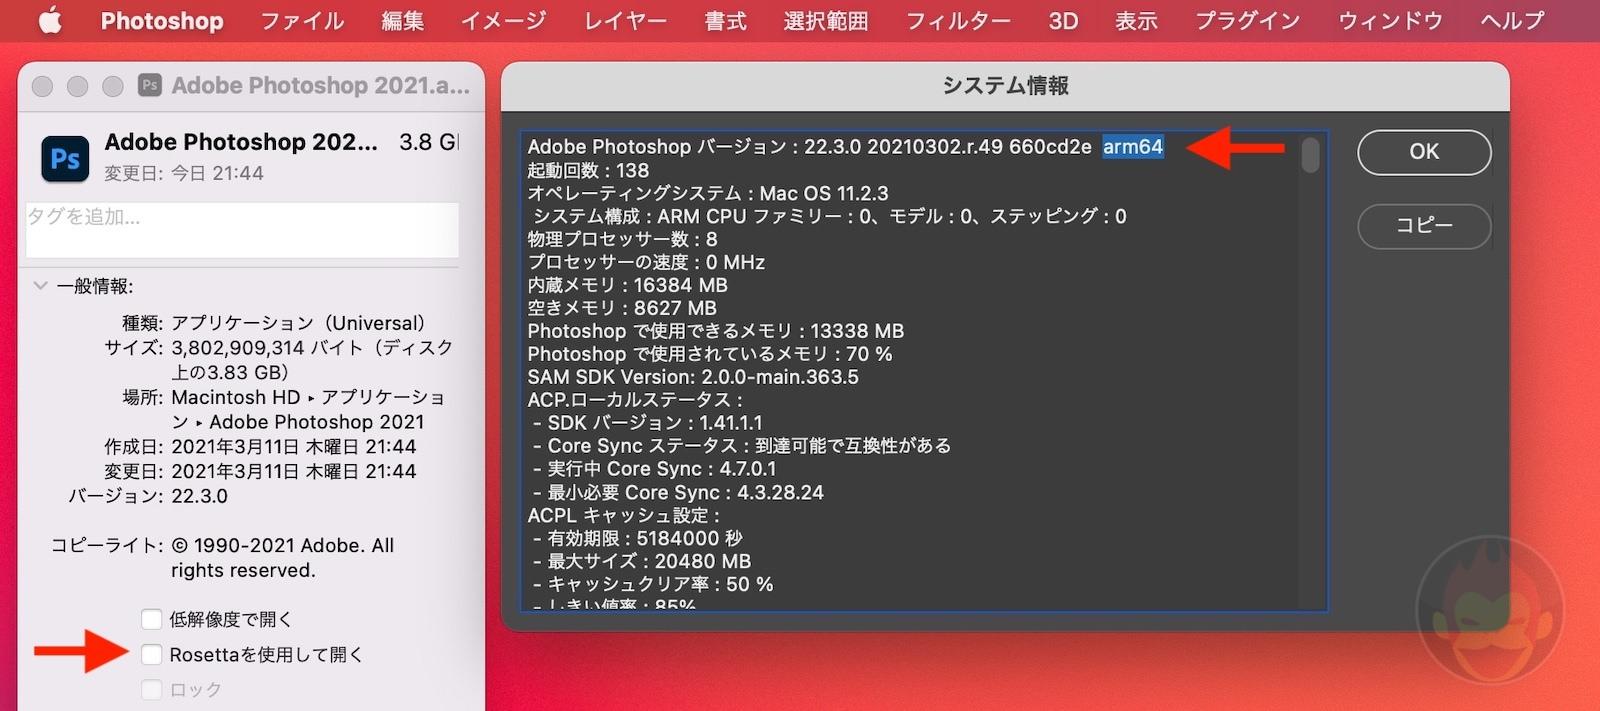 Adobe Photoshop How to run Native or Rosetta 03